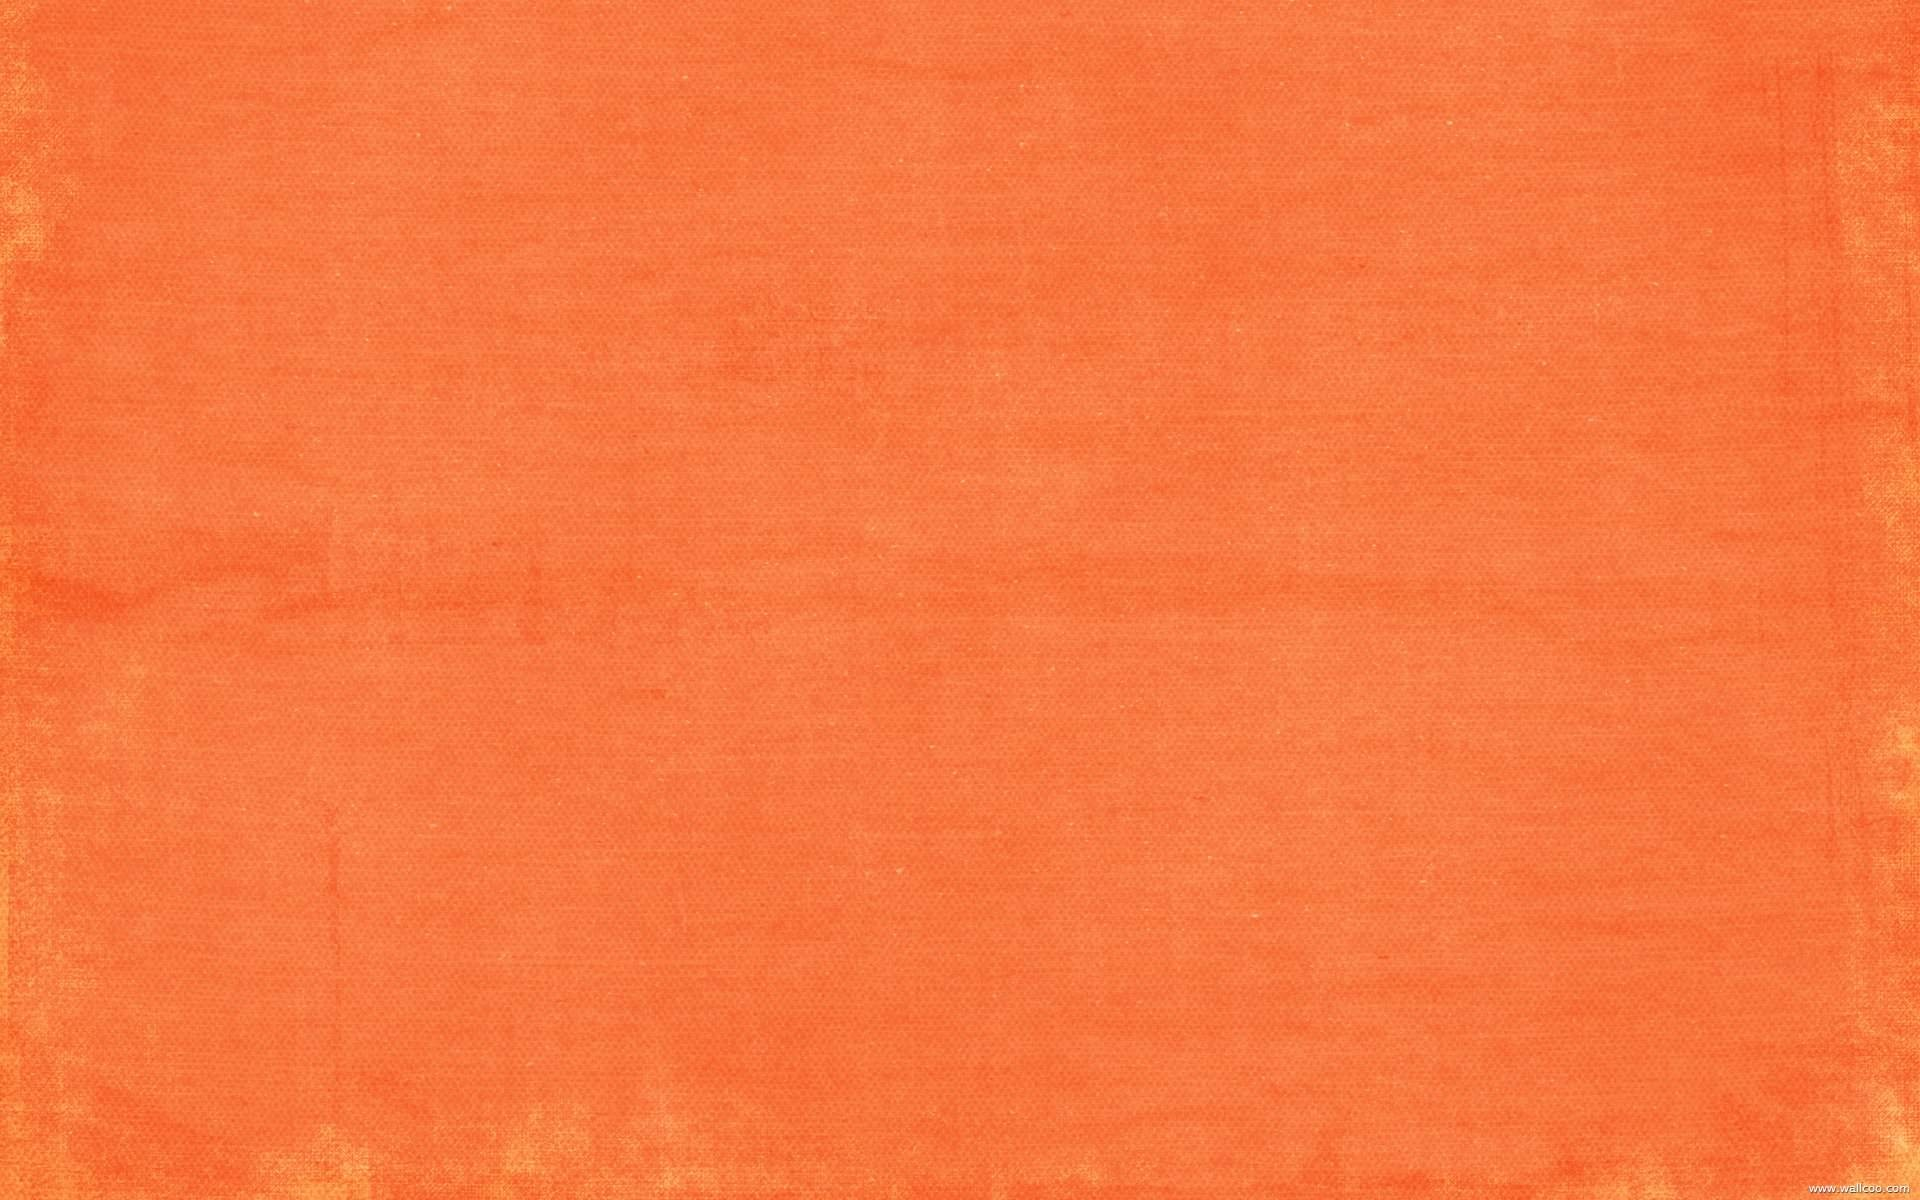 Orange Solid Wallpaper For You